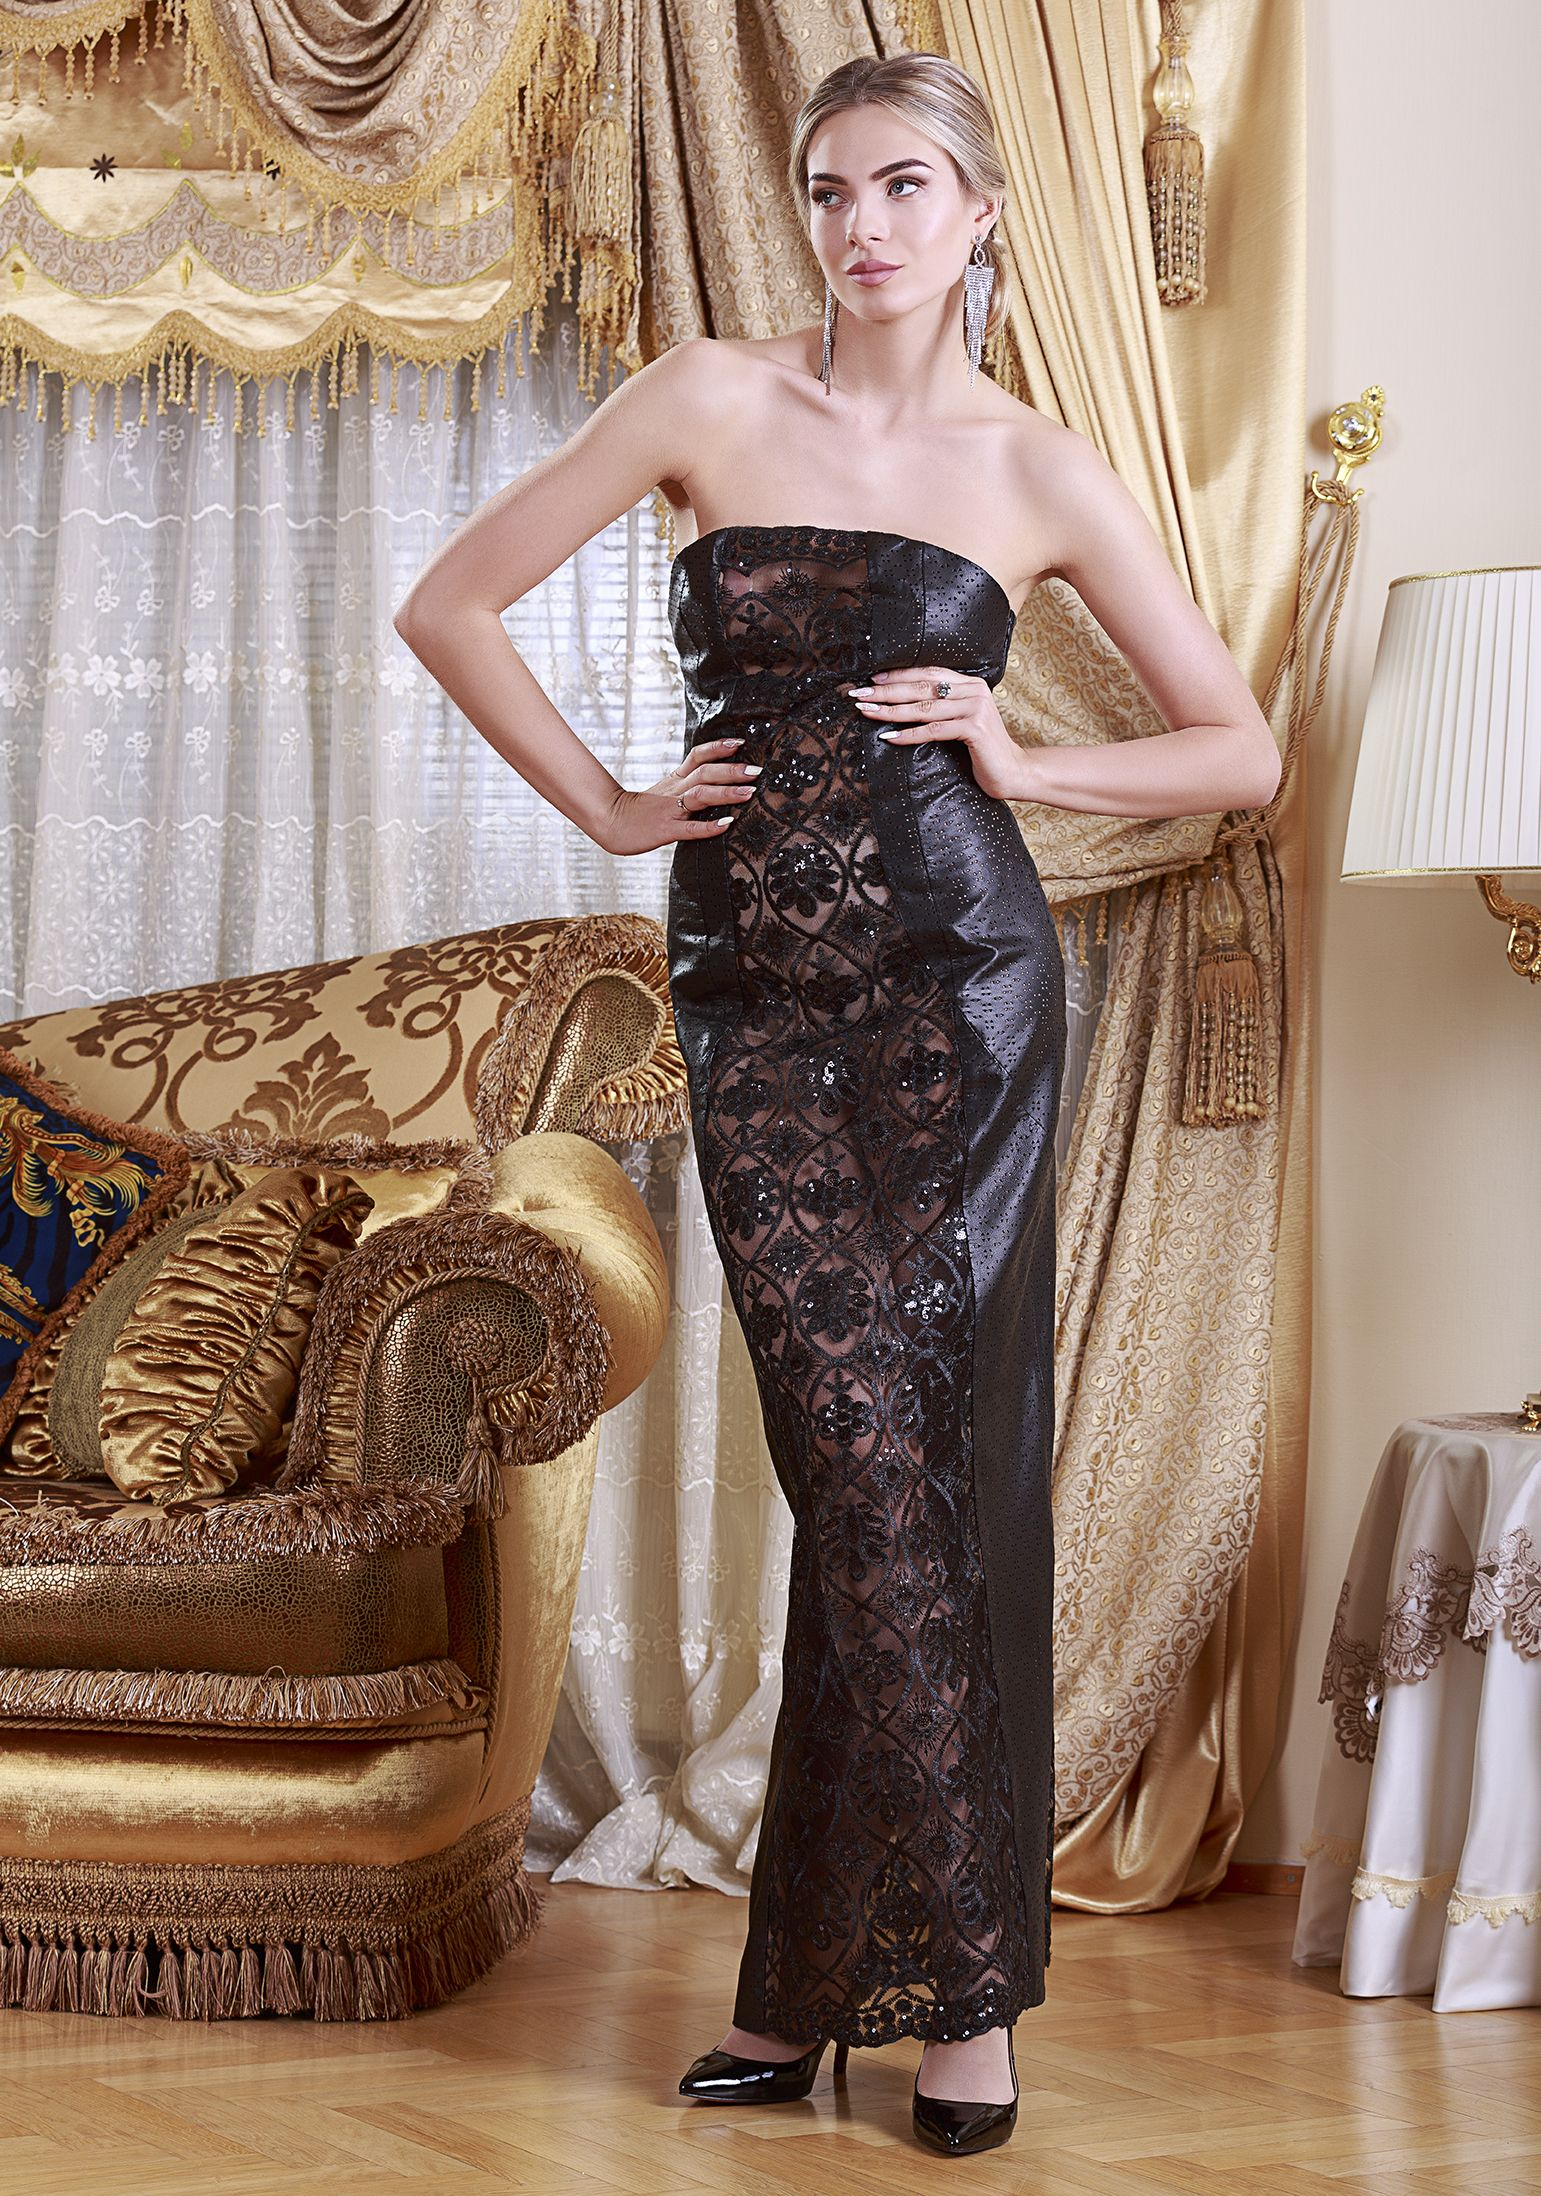 Evening reindeer leather dress by mariela pokka leather fashion